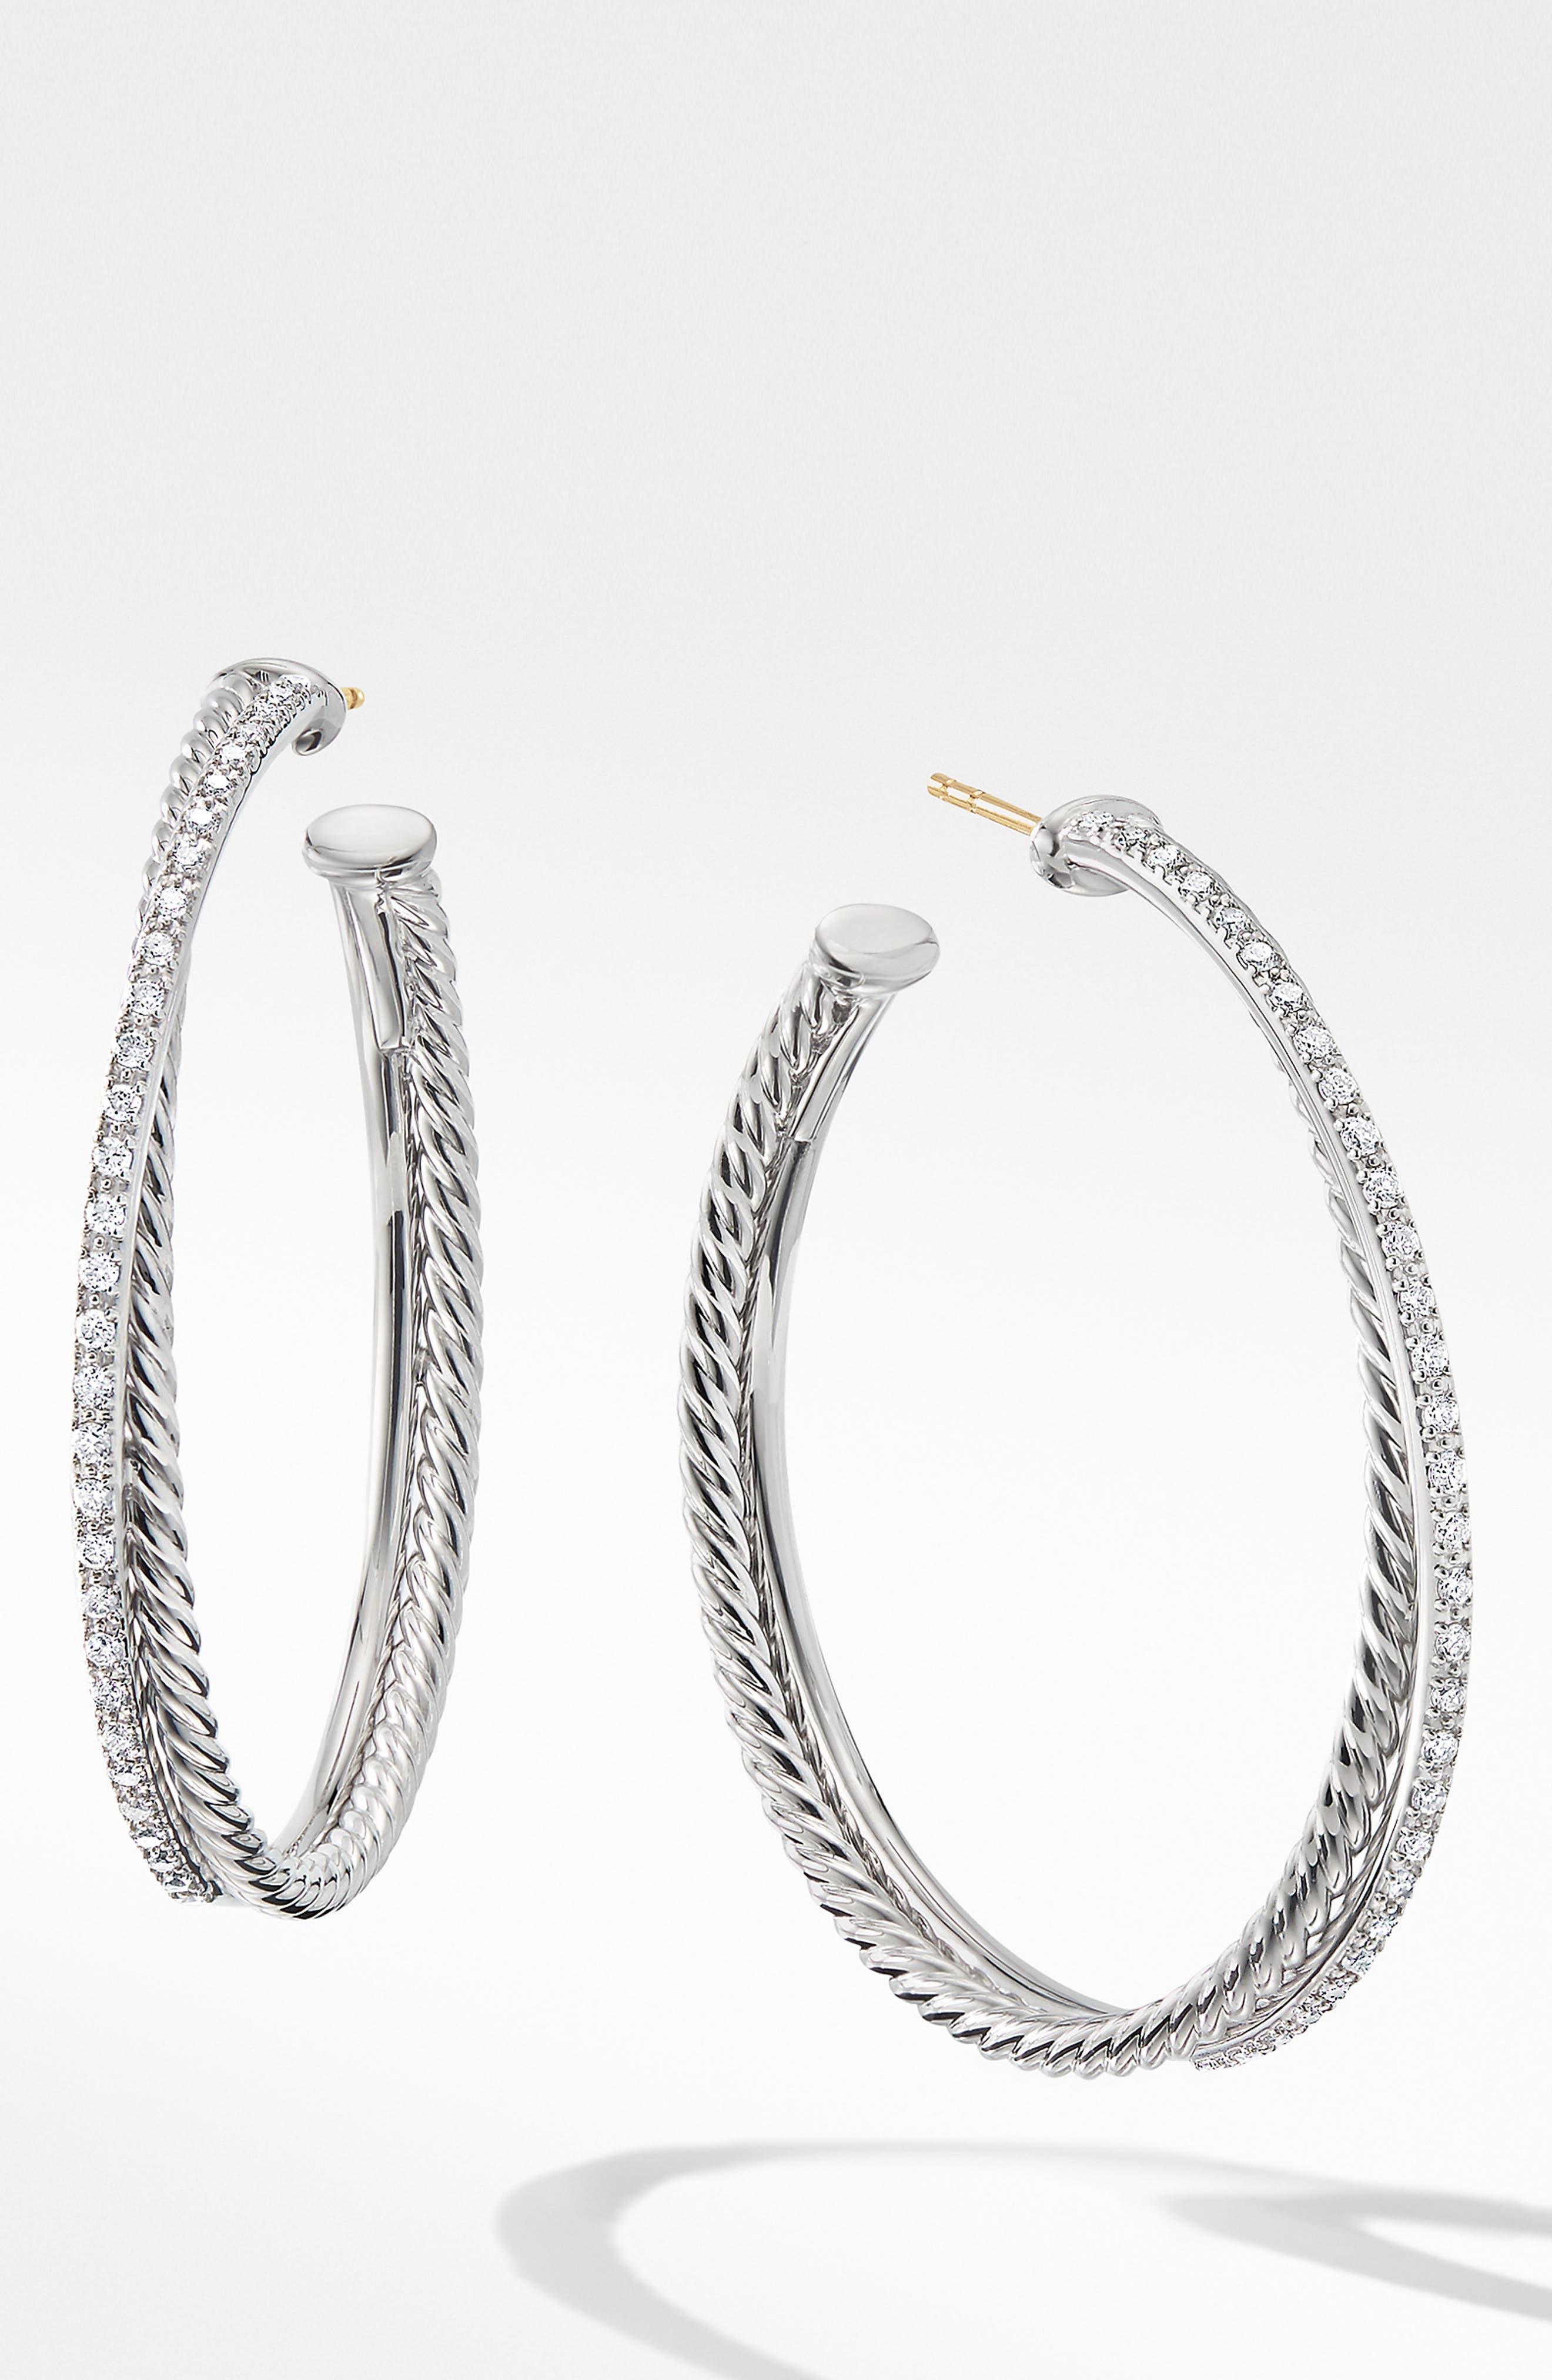 DAVID YURMAN Extra Large Crossover Hoop Earrings with Diamonds, Main, color, SILVER/ DIAMOND